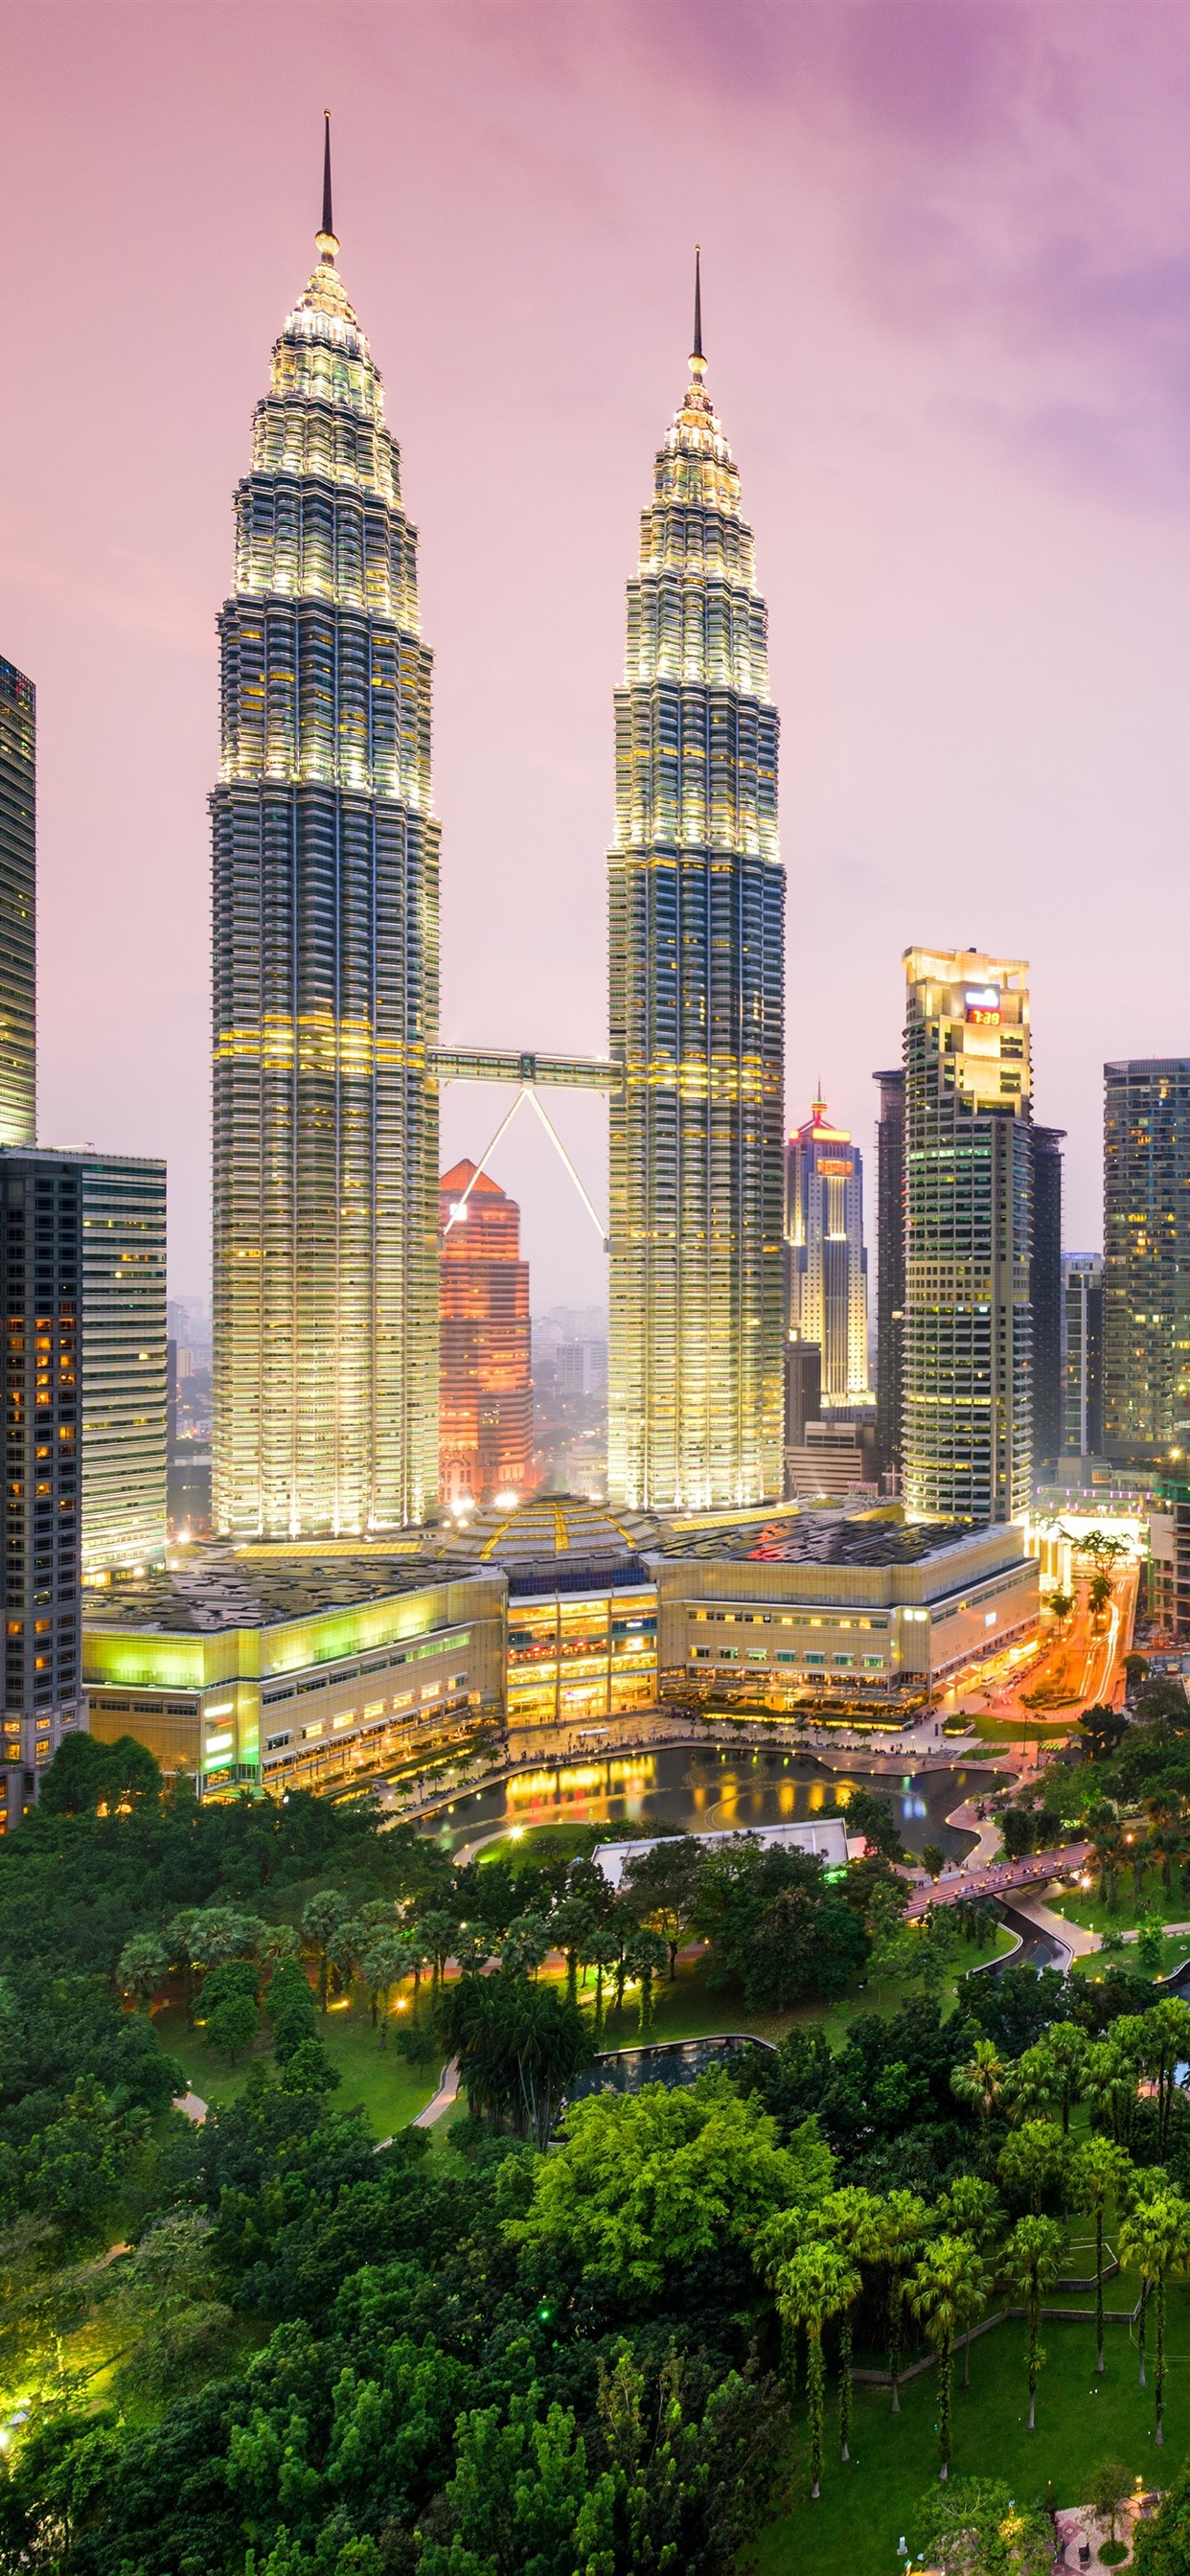 Malaysia Kuala Lumpur Skyscrapers City Lights Dusk